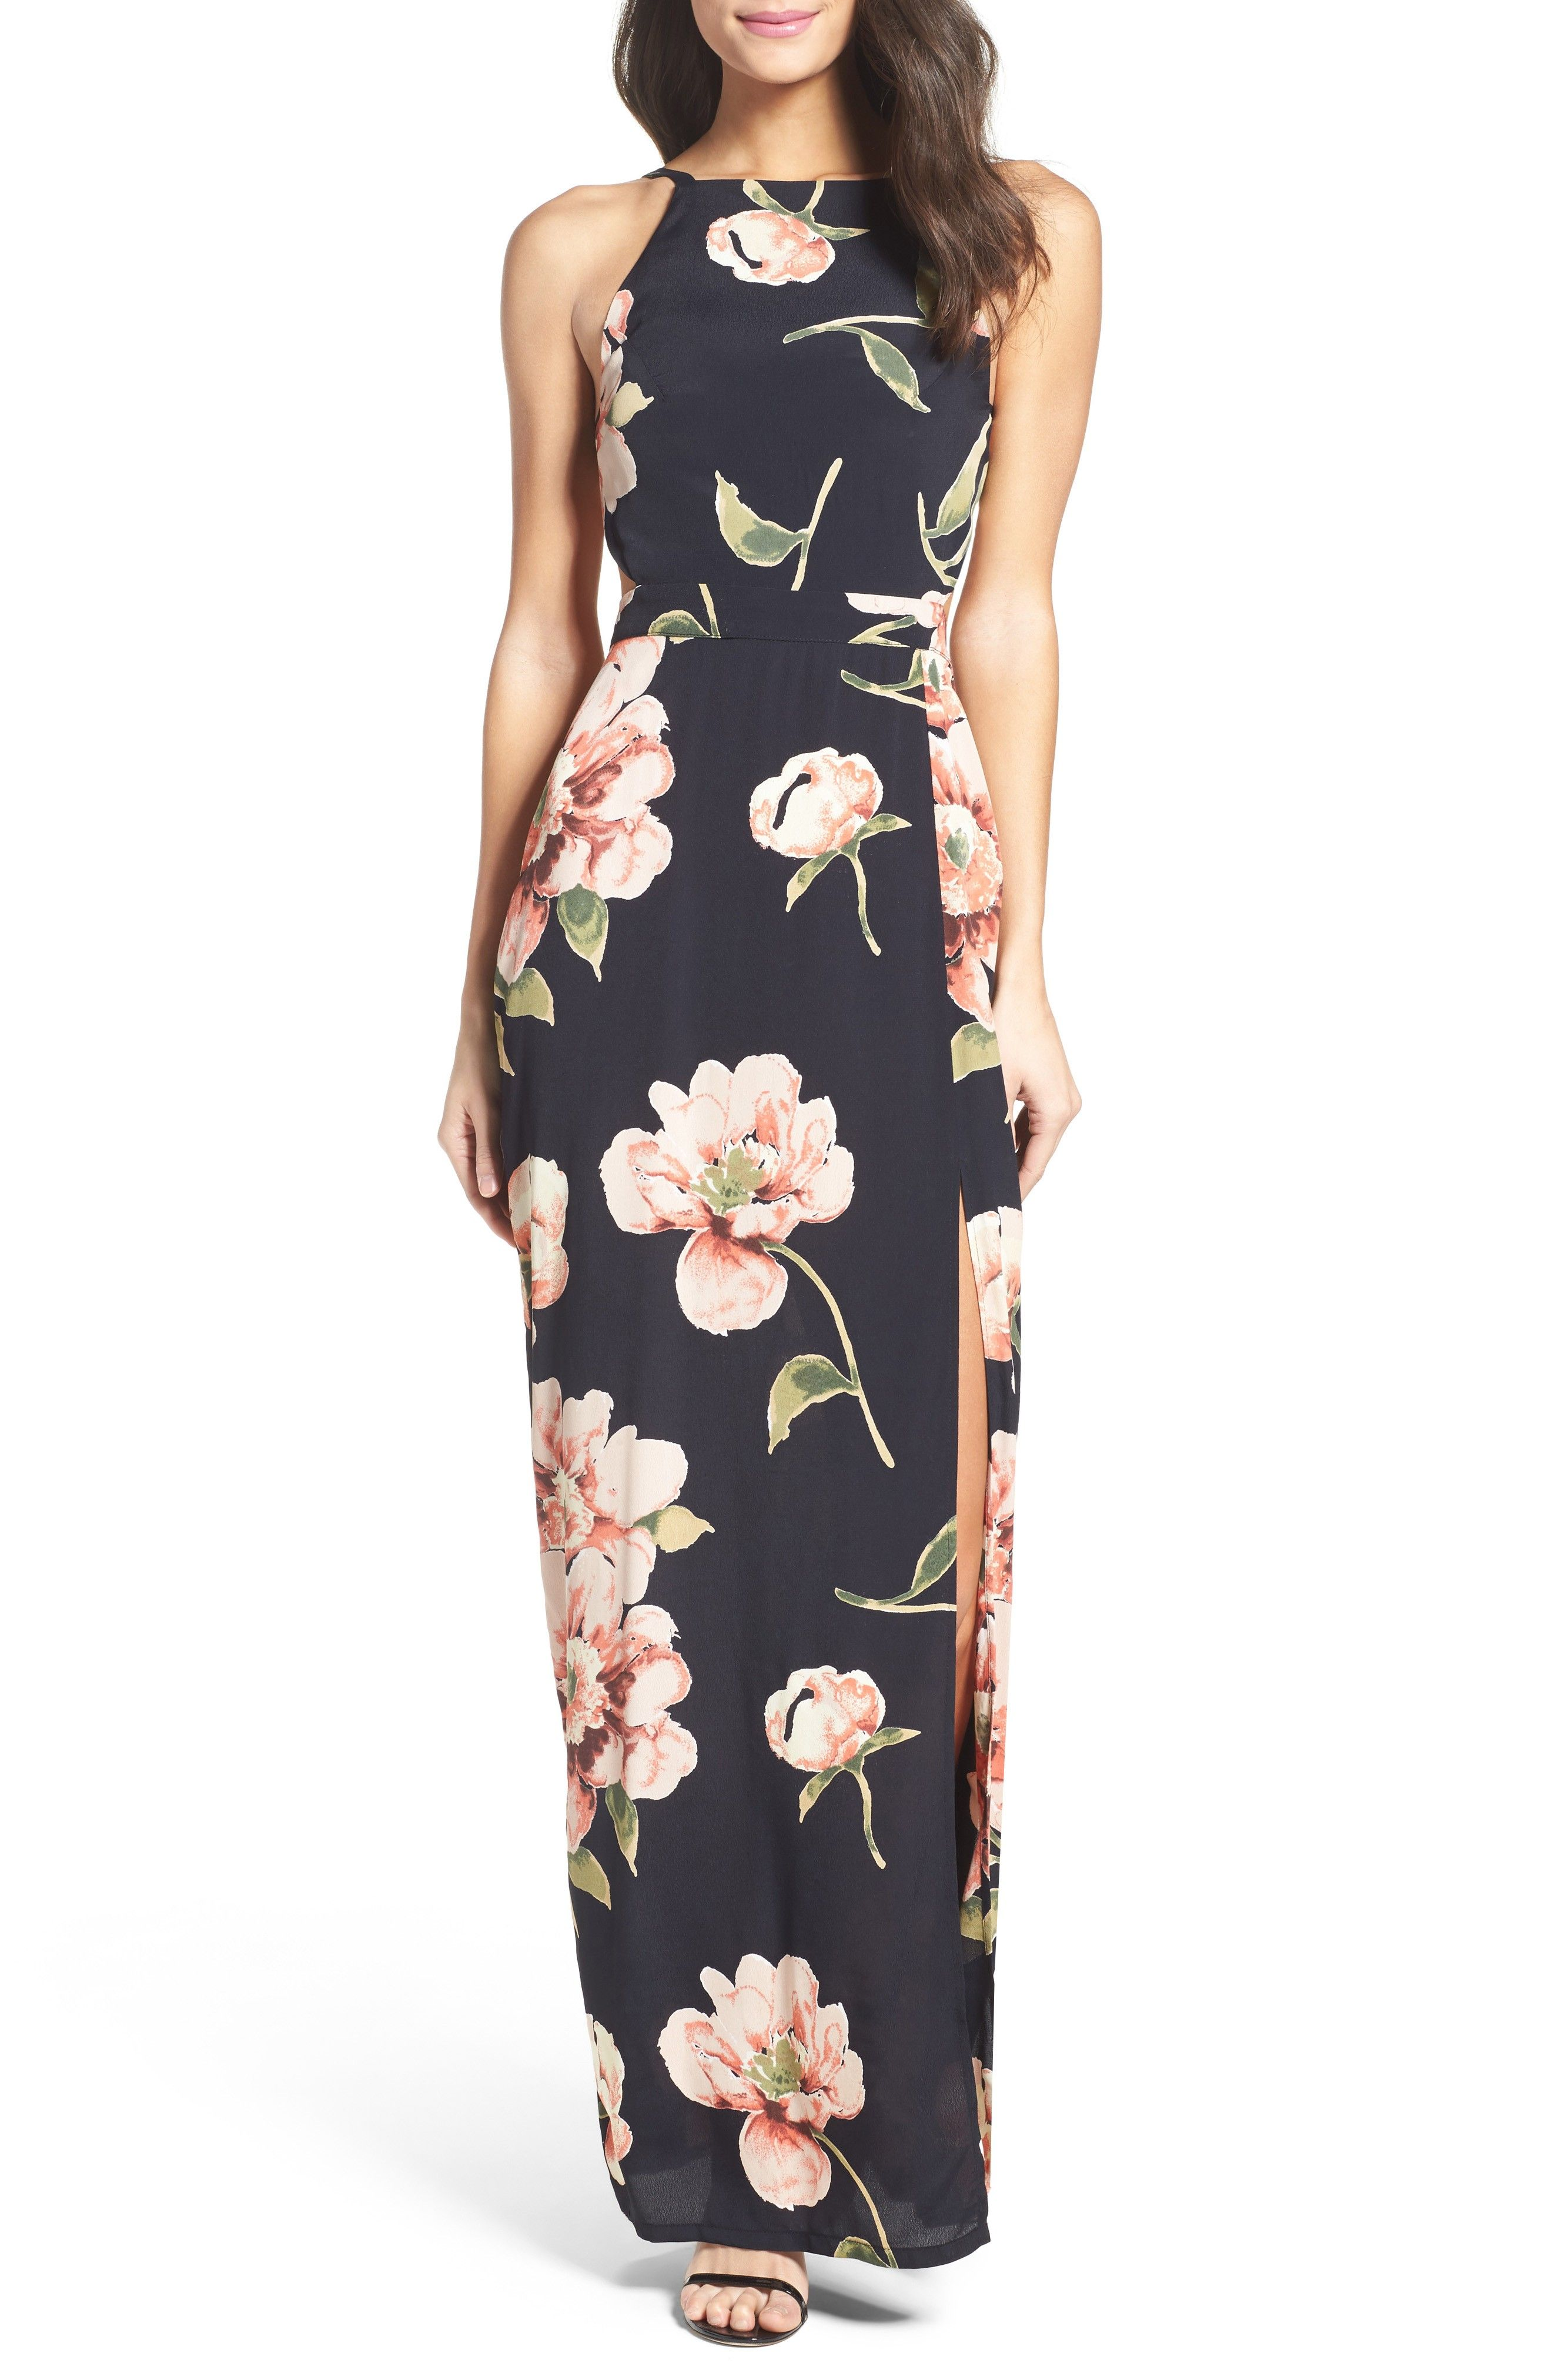 Dark Floral Maxi Dresses Dress For The Wedding Maxi Dress Womens Bridesmaid Dresses Pretty Maxi Dress [ 4048 x 2640 Pixel ]